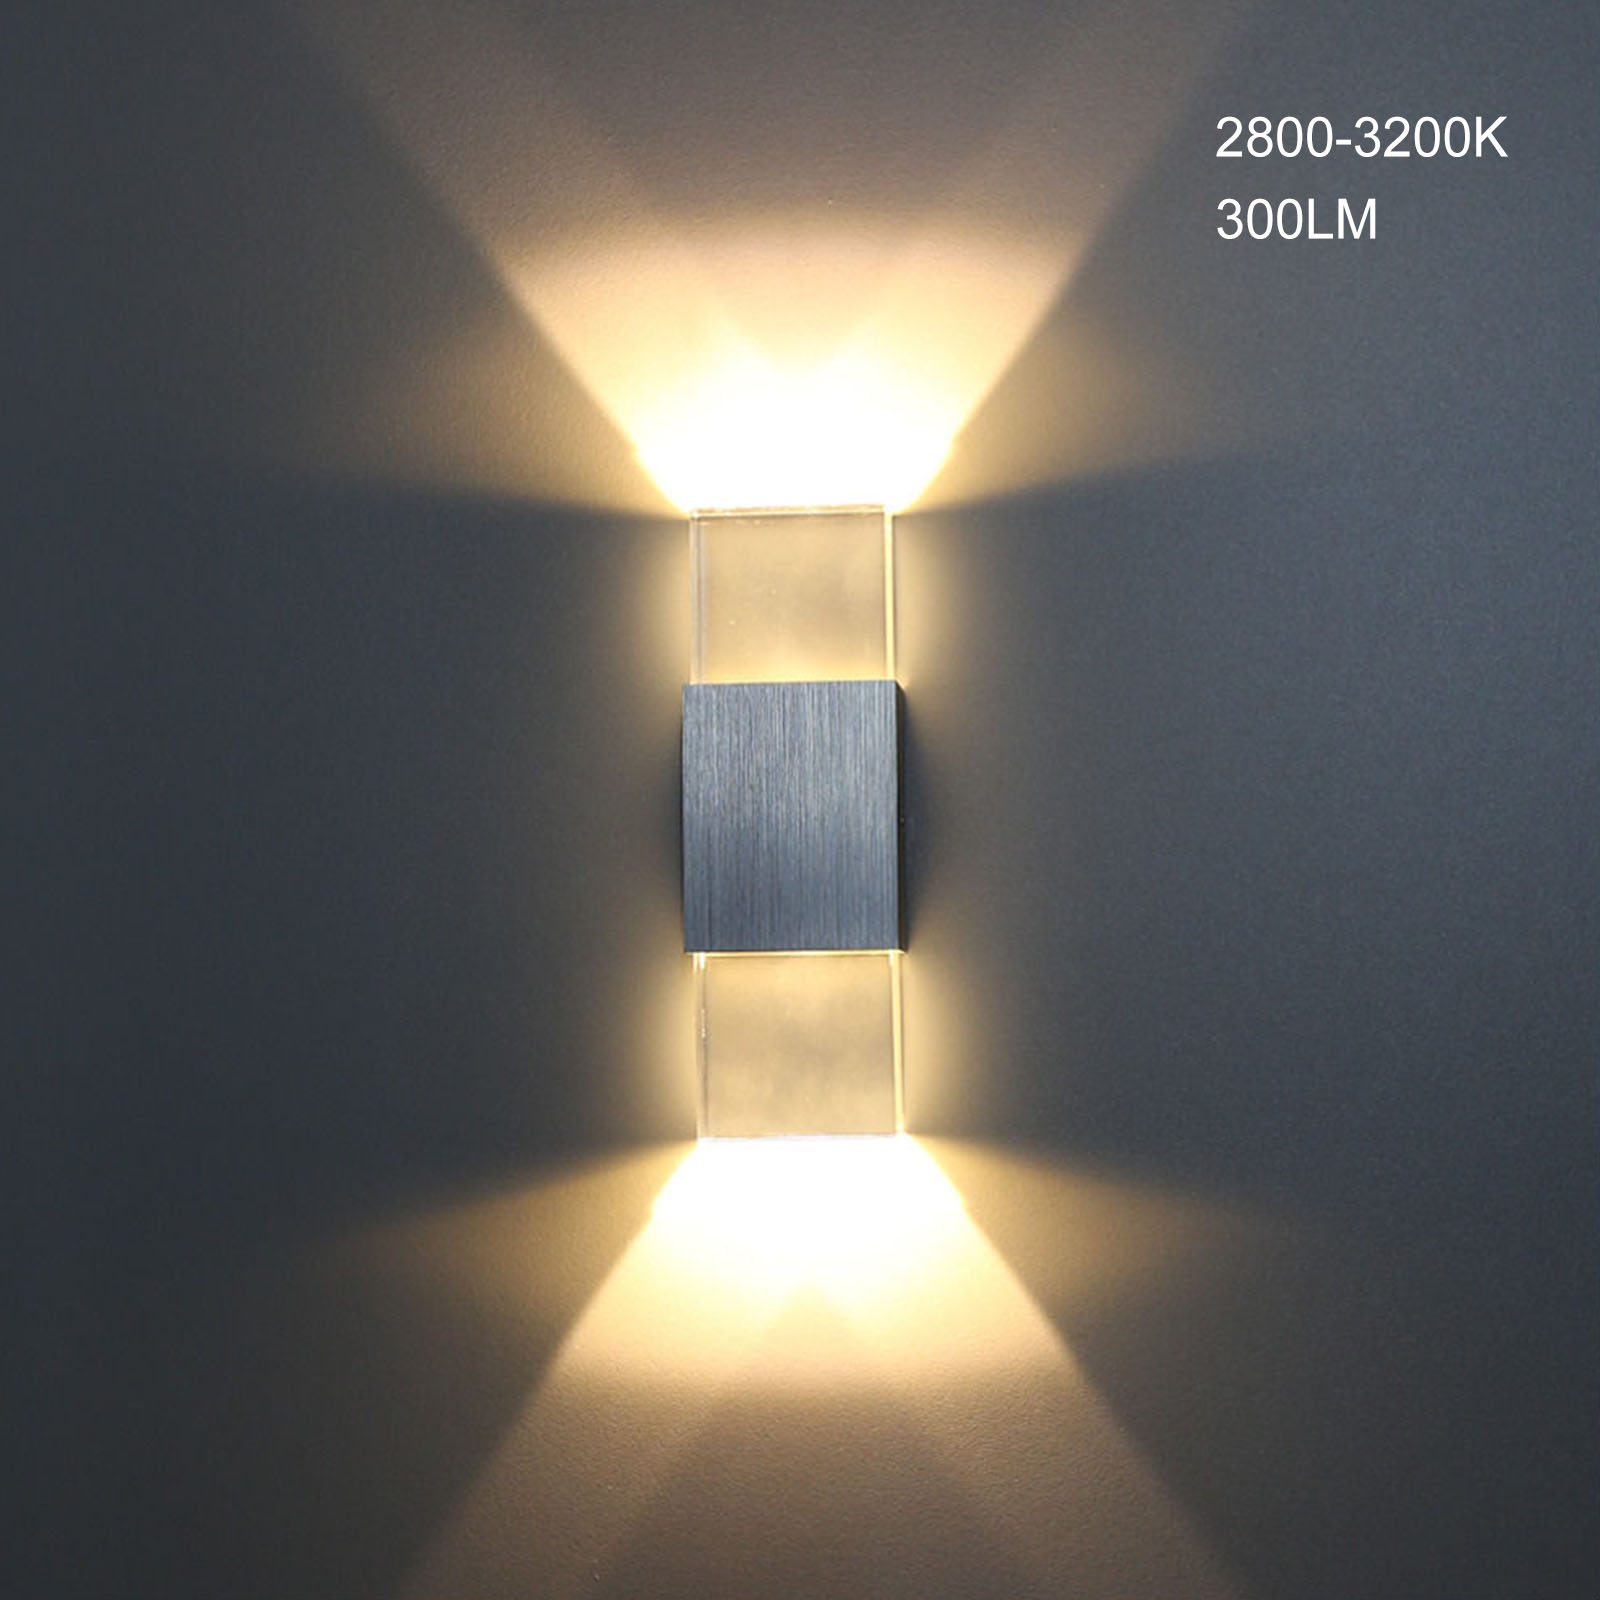 Licht & Beleuchtung Gastfreundlich 6 W Moderne Platz Aluminium Cob Led Wand Lampe Licht Acryl Kristall Ac110 220 V Hause Beleuchtung Indoor Outdoor Dekoration